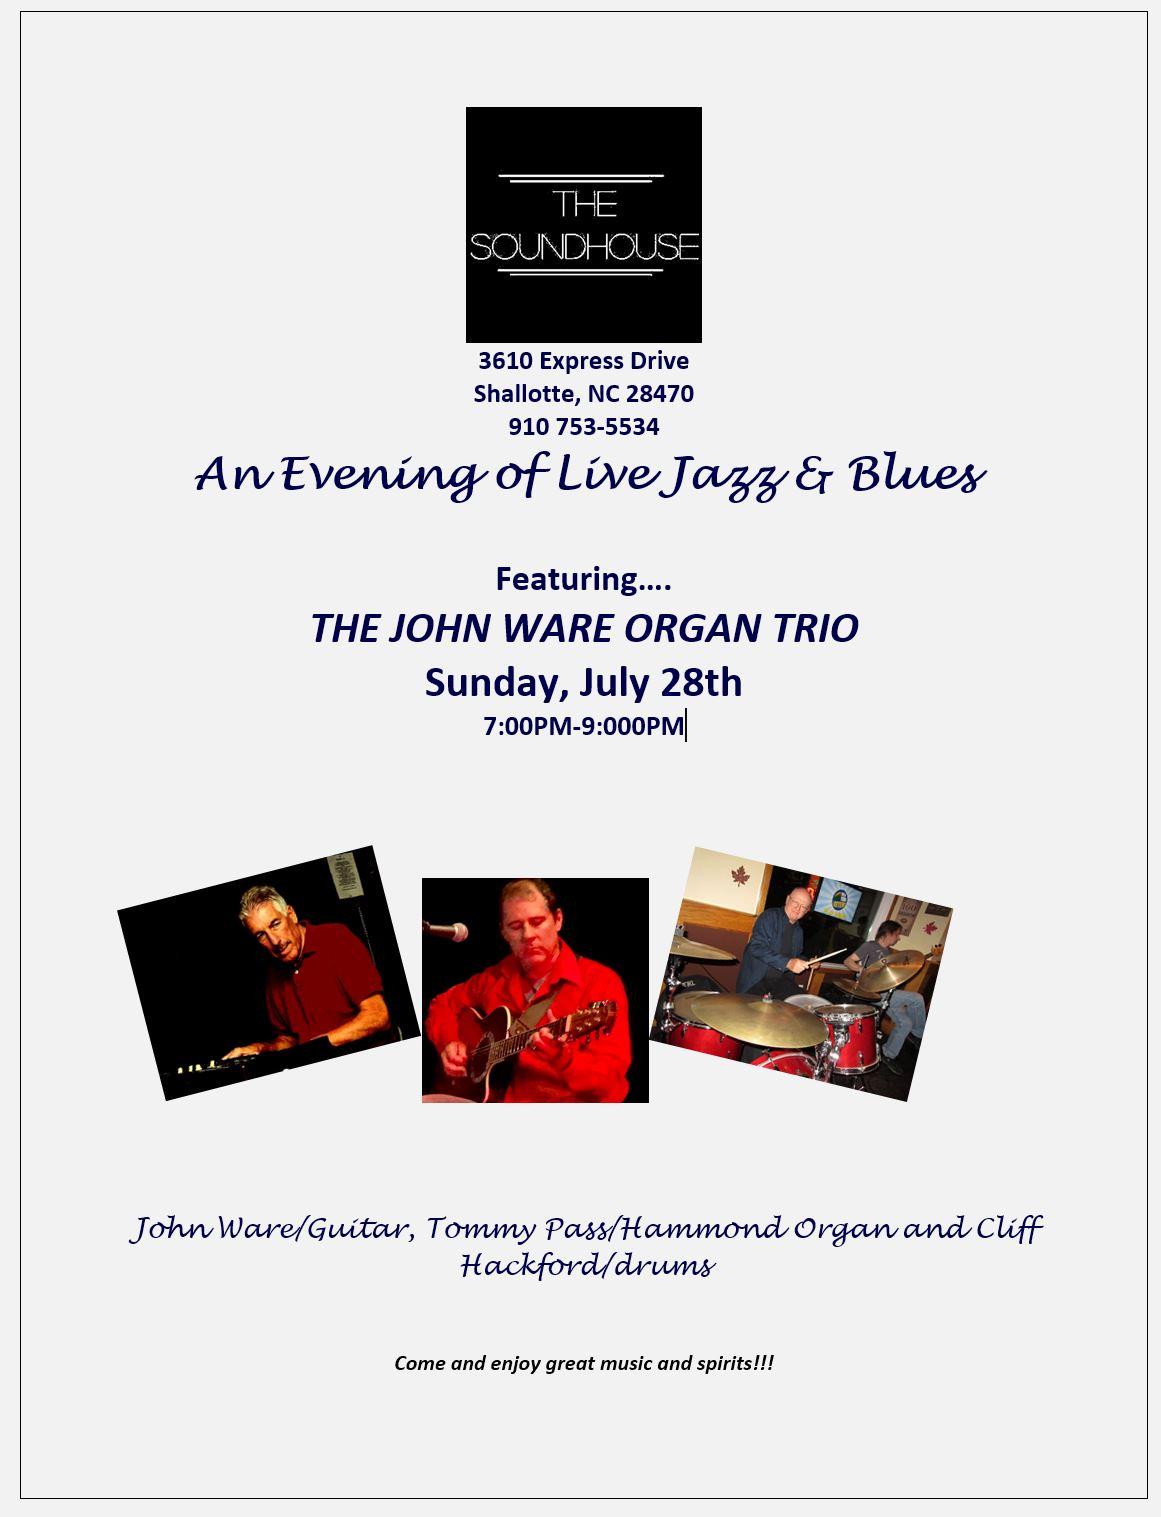 John Ware Organ Trio